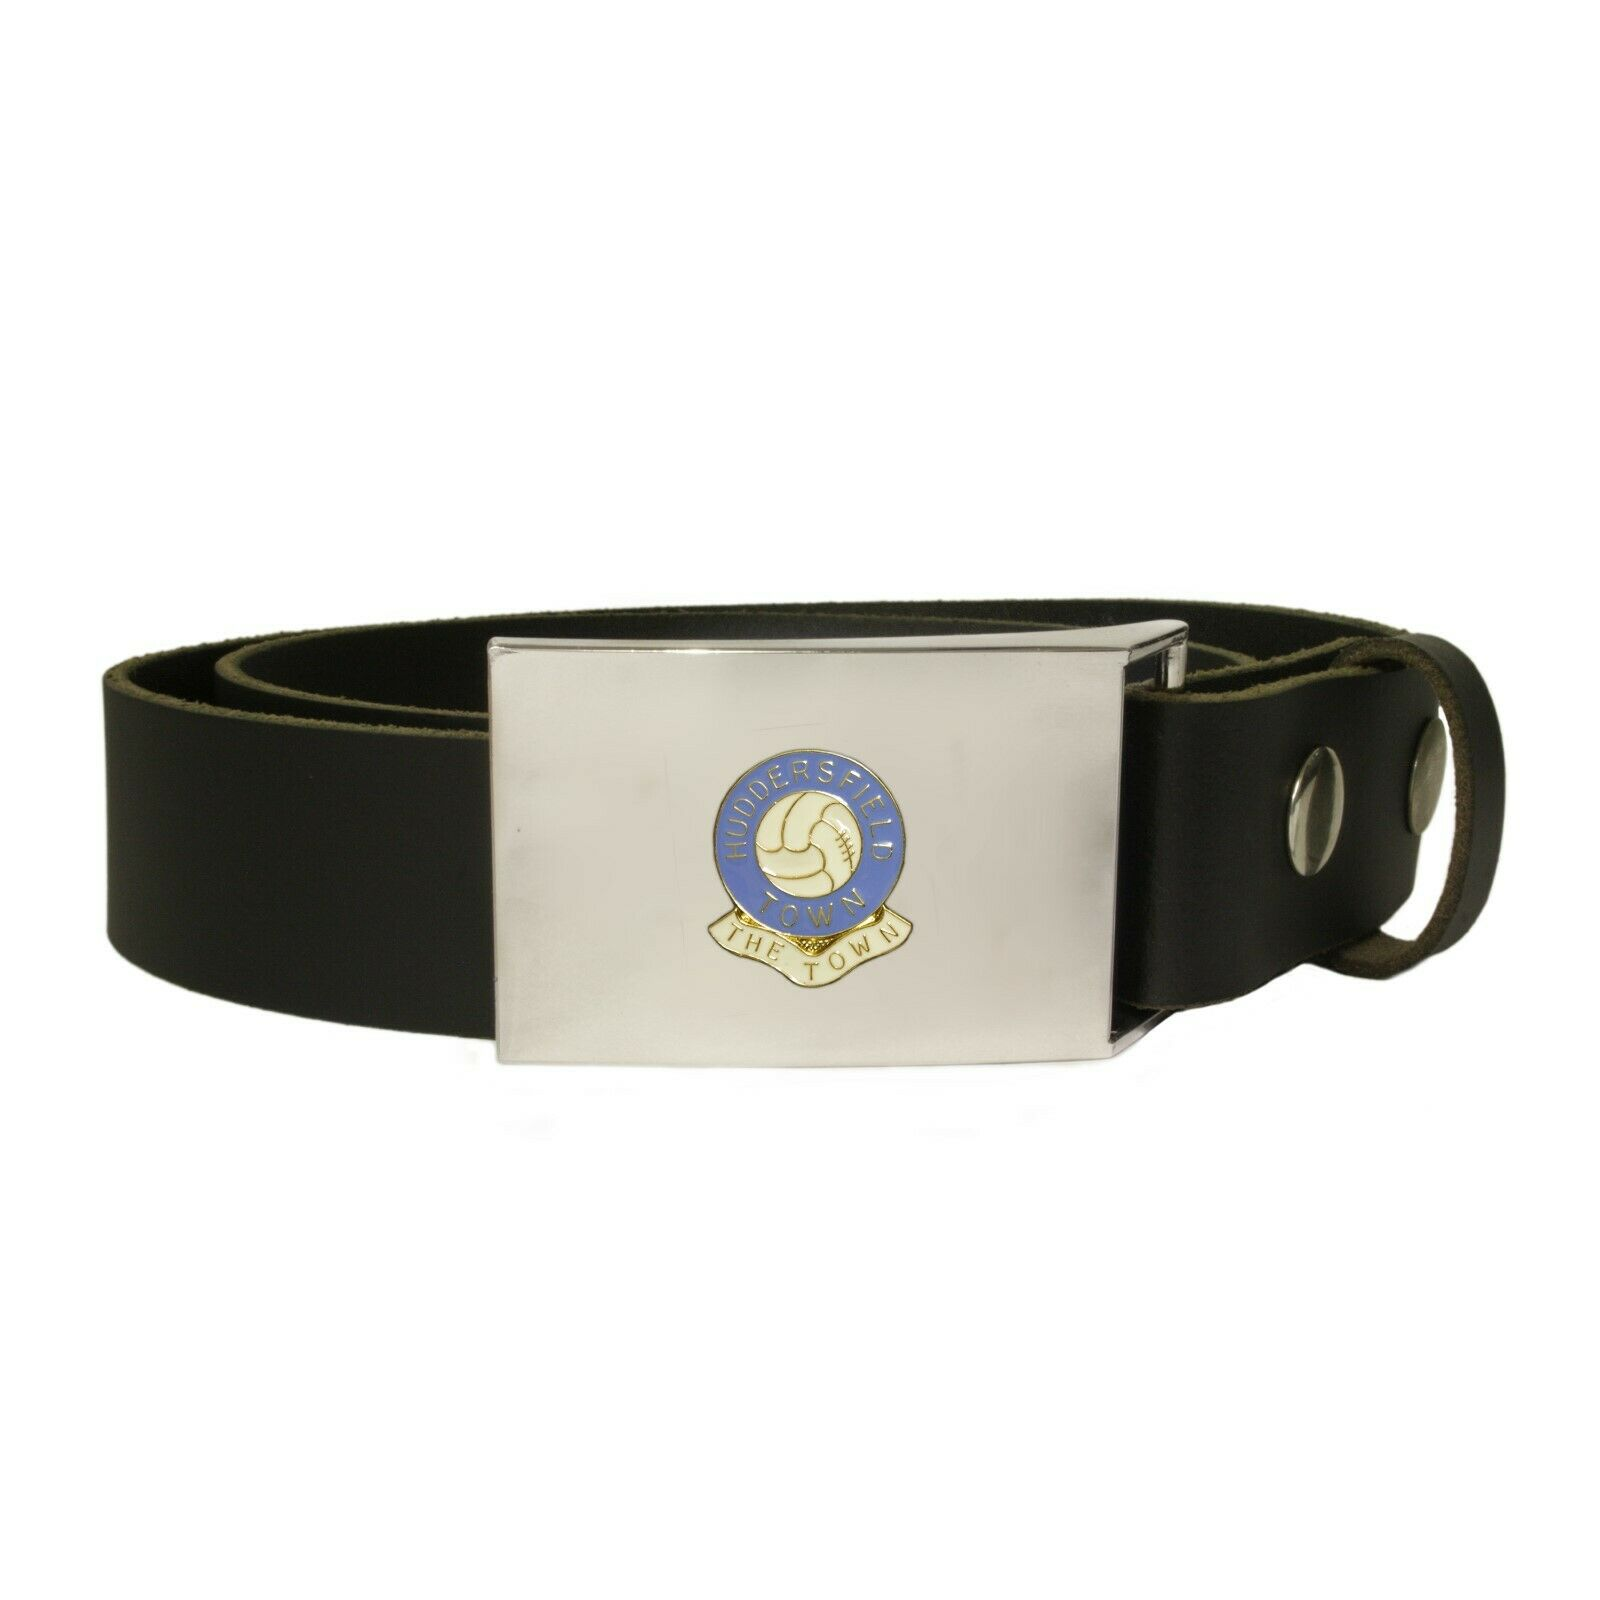 Huddersfield Town football club leather snap fit belt